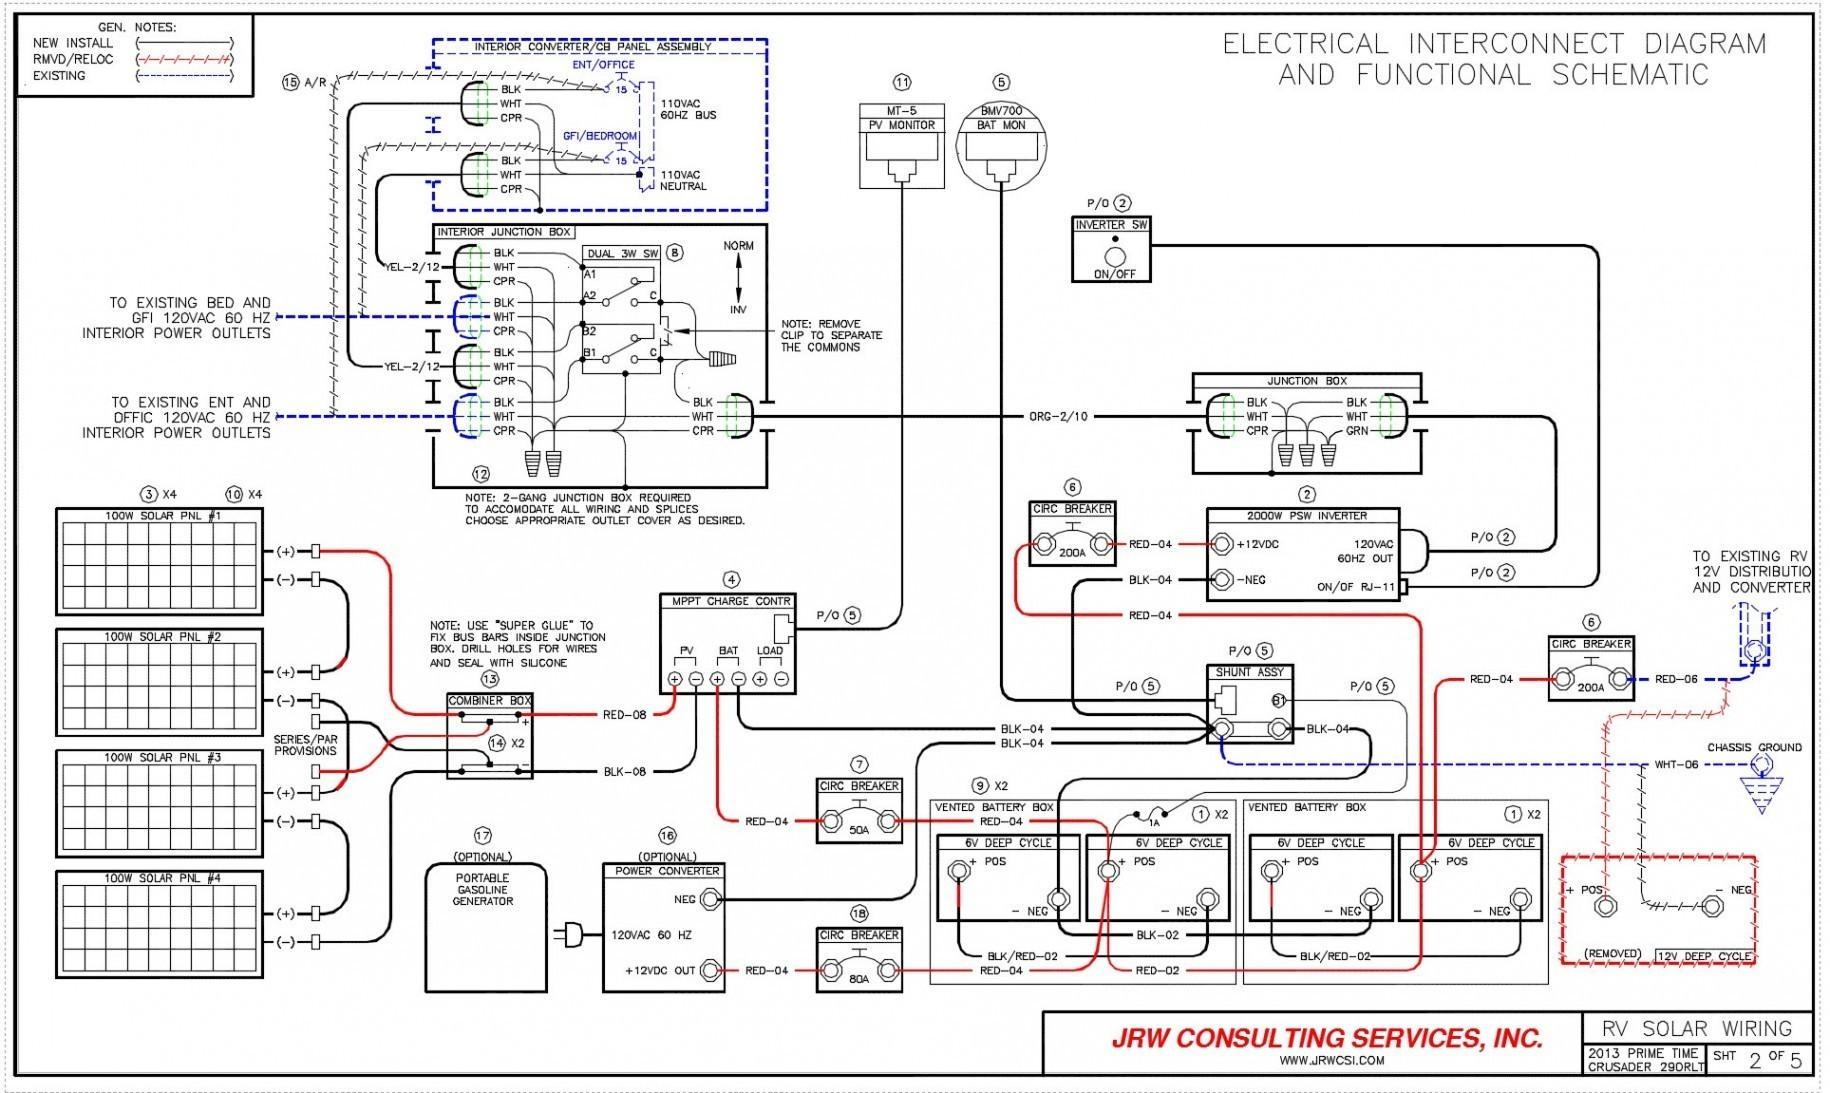 coachman caravan wiring diagram simple electrical wiring diagram keystone rv wiring schematic coachmen chaparral wiring diagram